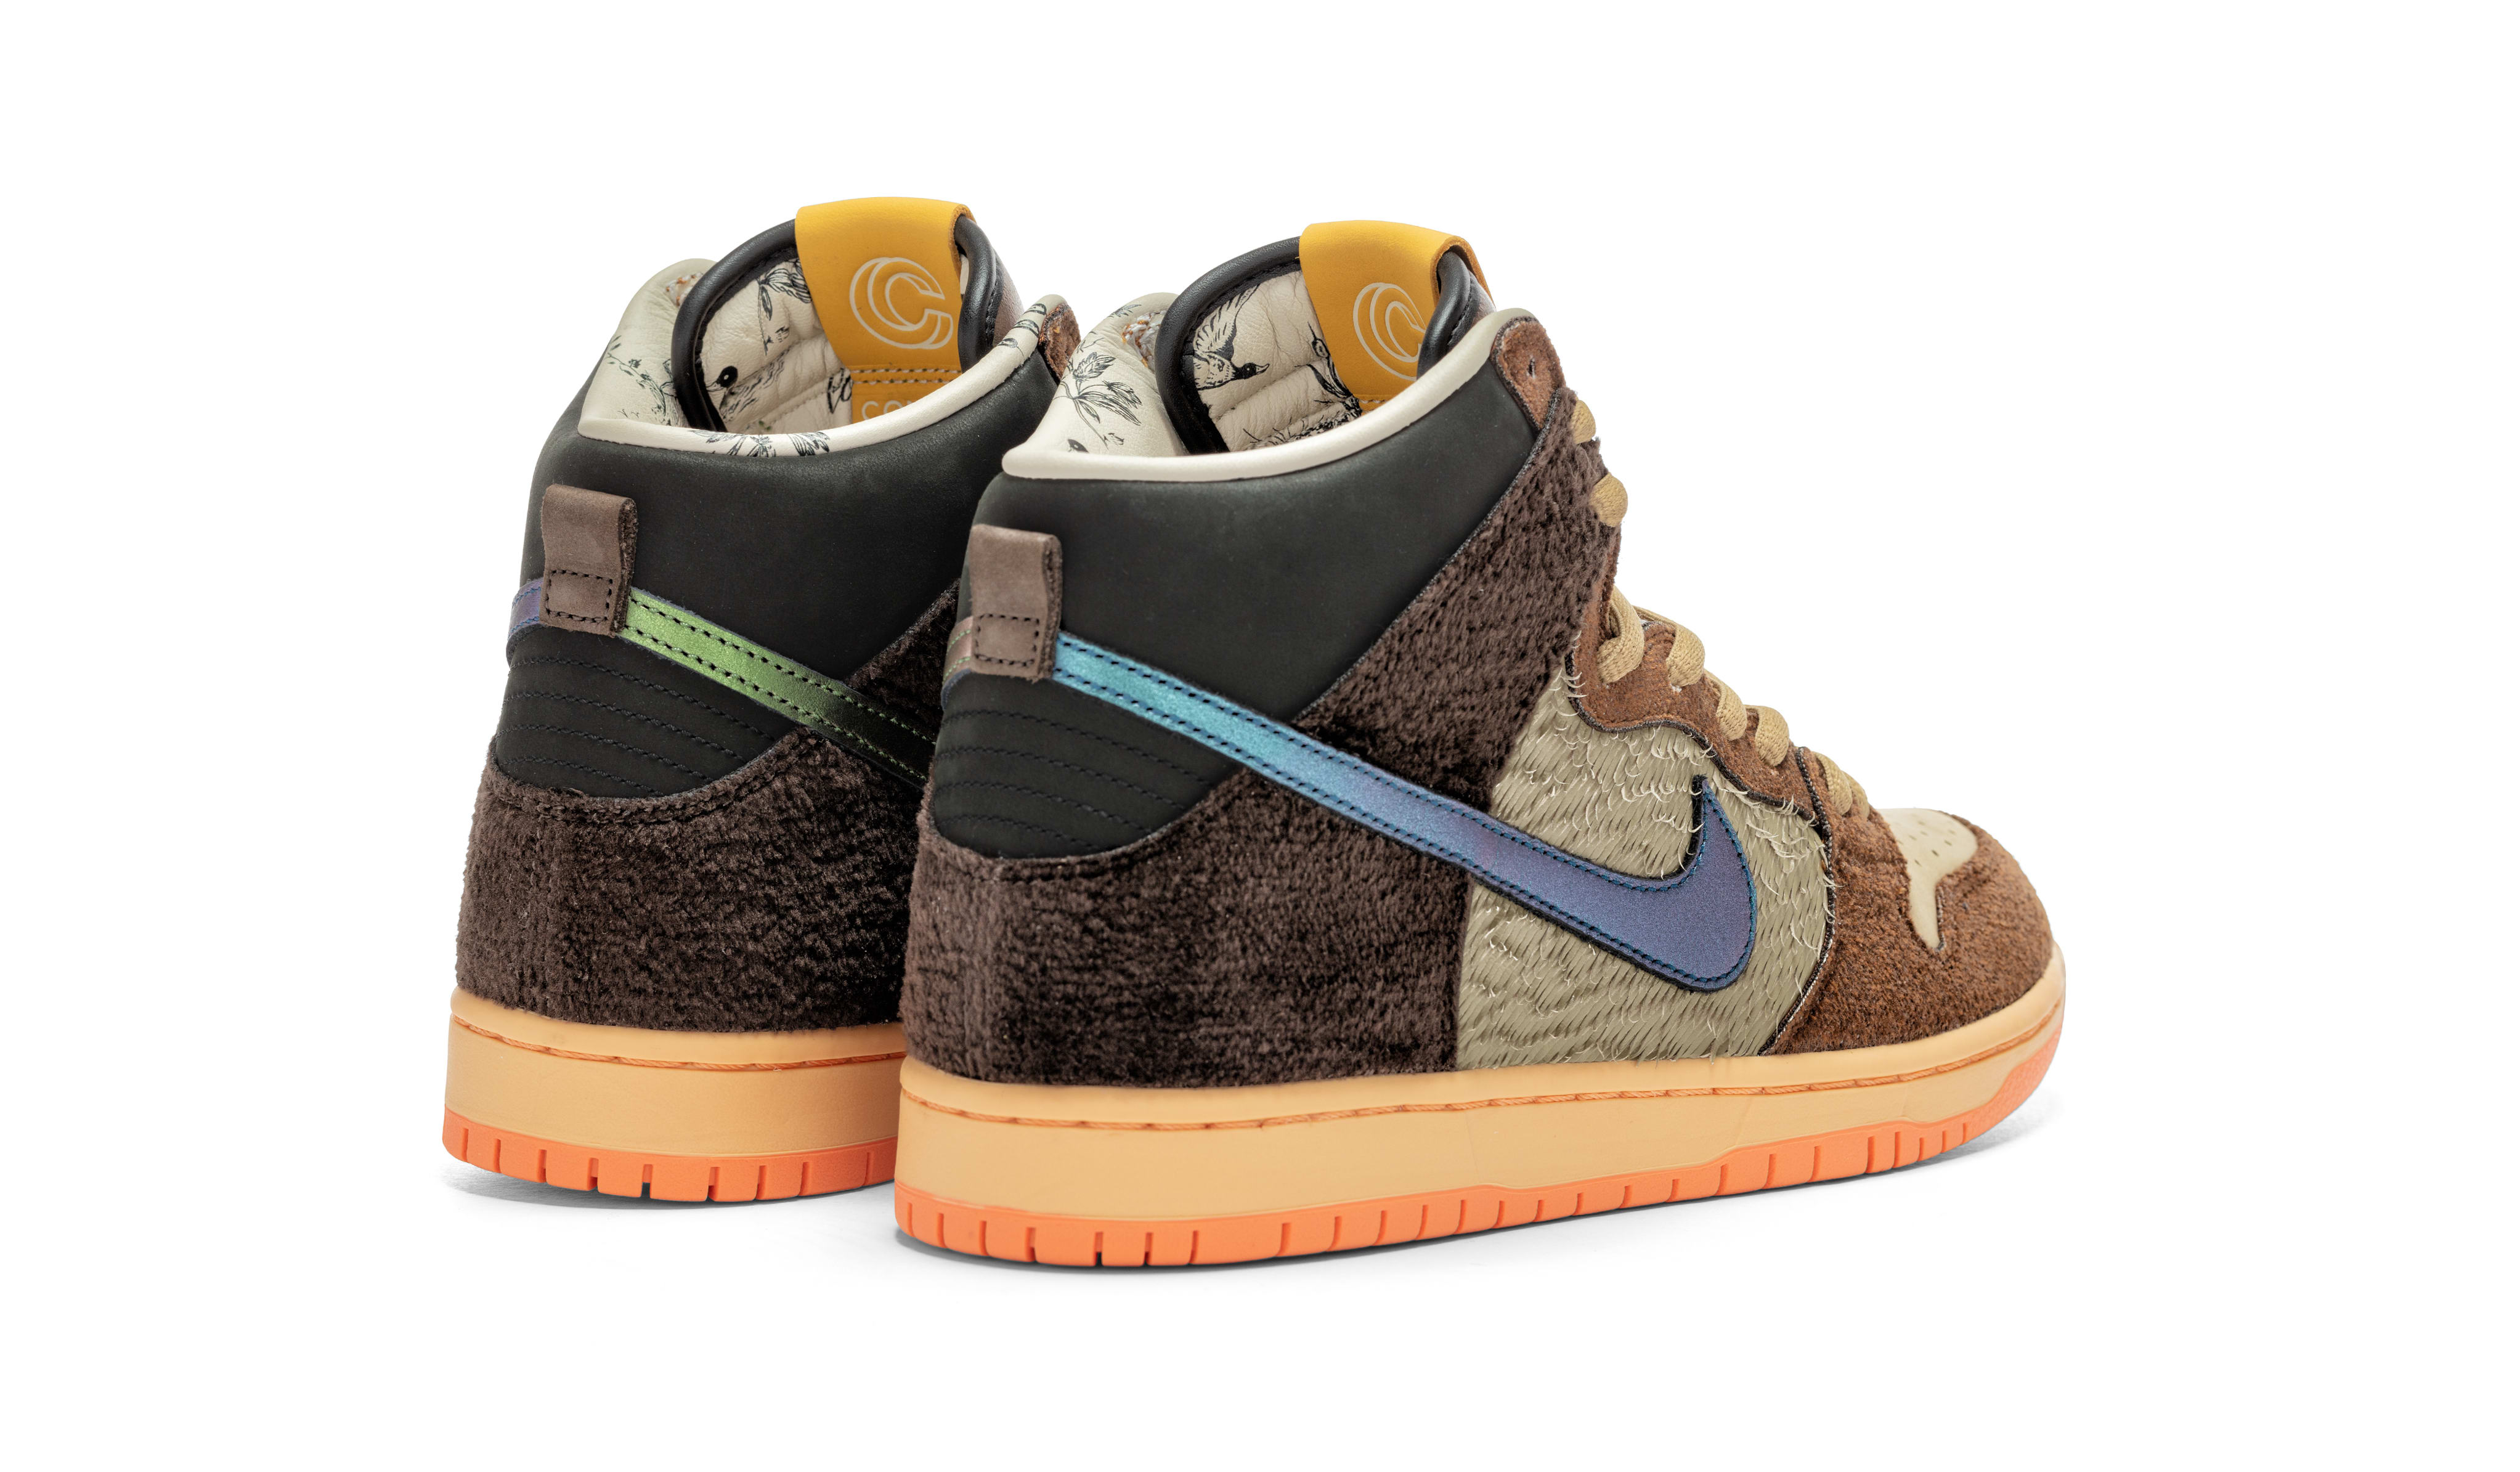 Concepts x Nike SB Dunk High 'TurDunken' DC6887-200 Heel